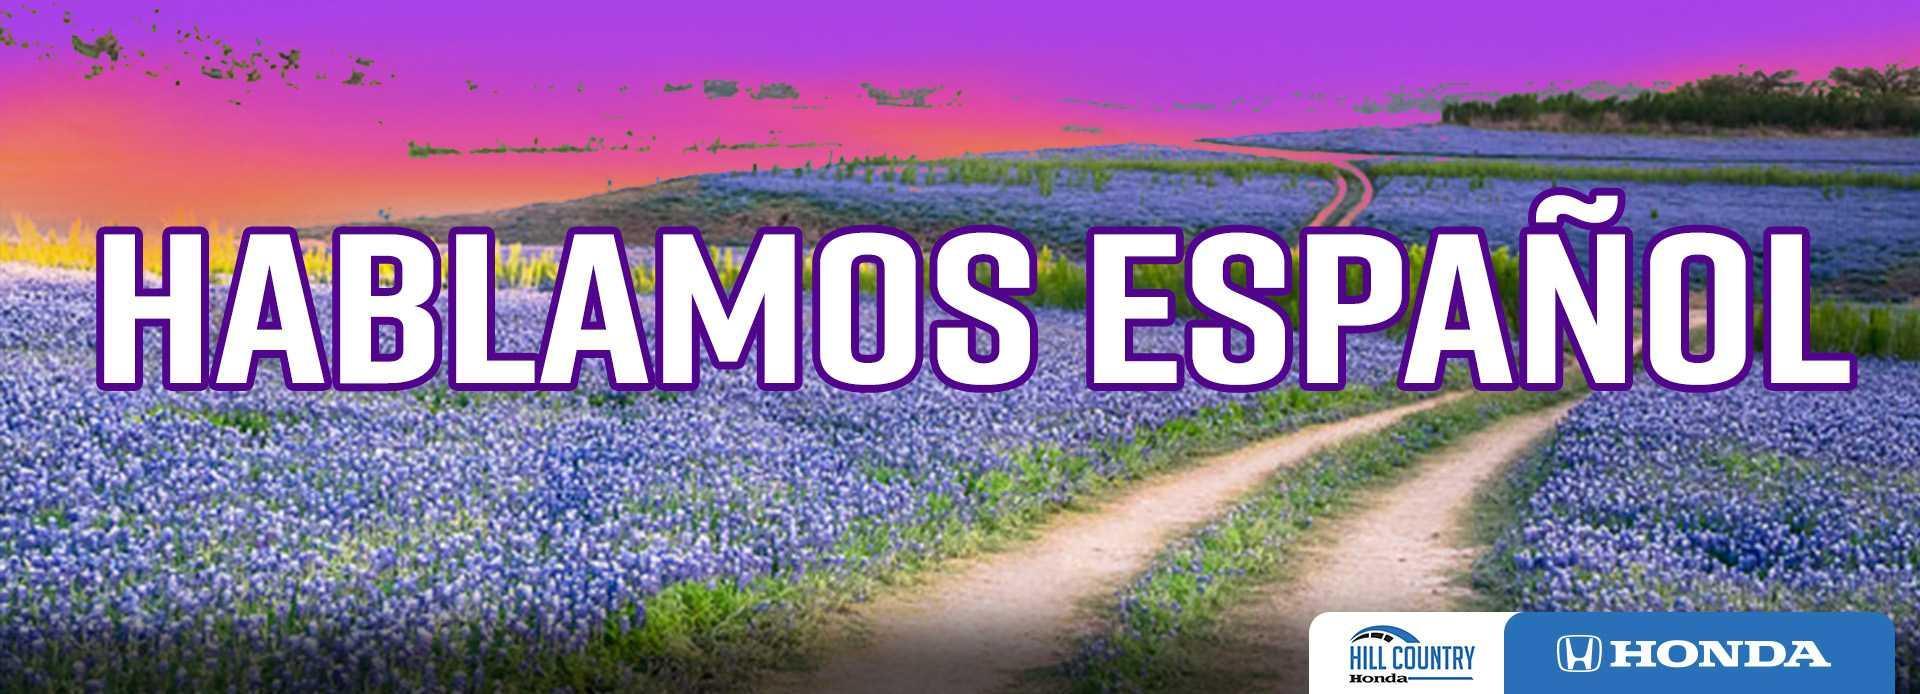 We speak Spanish banner